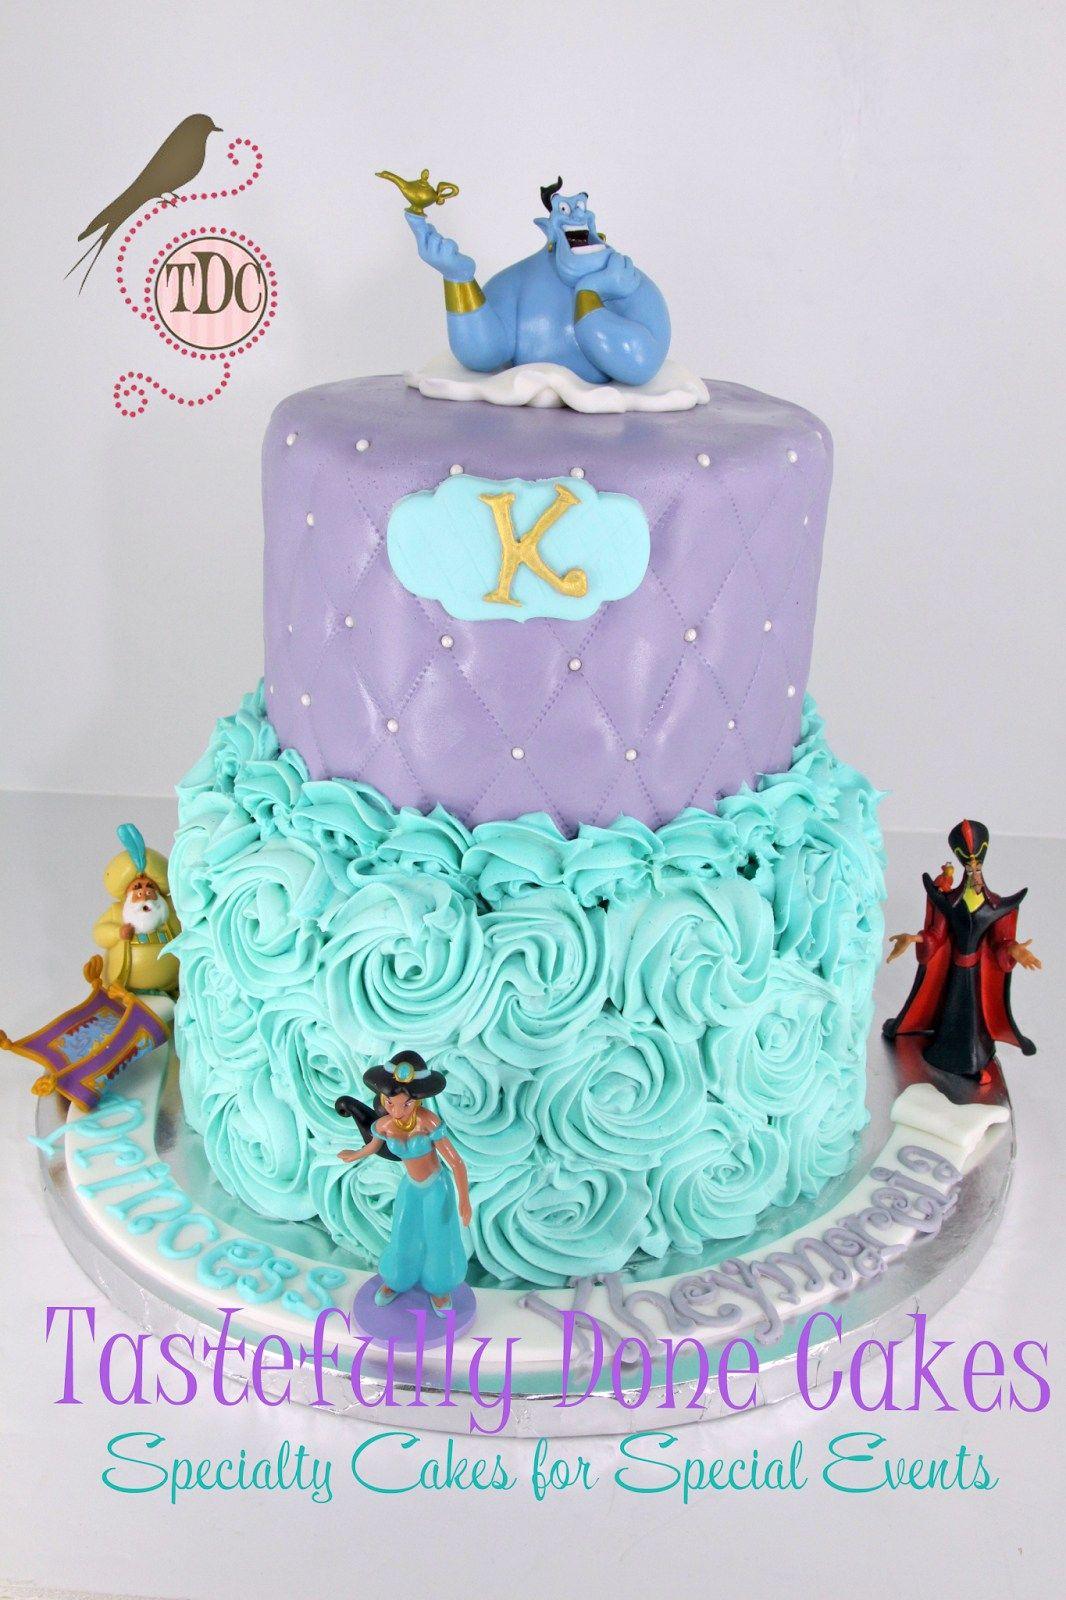 Pleasant 32 Amazing Photo Of Princess Jasmine Birthday Cake With Images Personalised Birthday Cards Petedlily Jamesorg